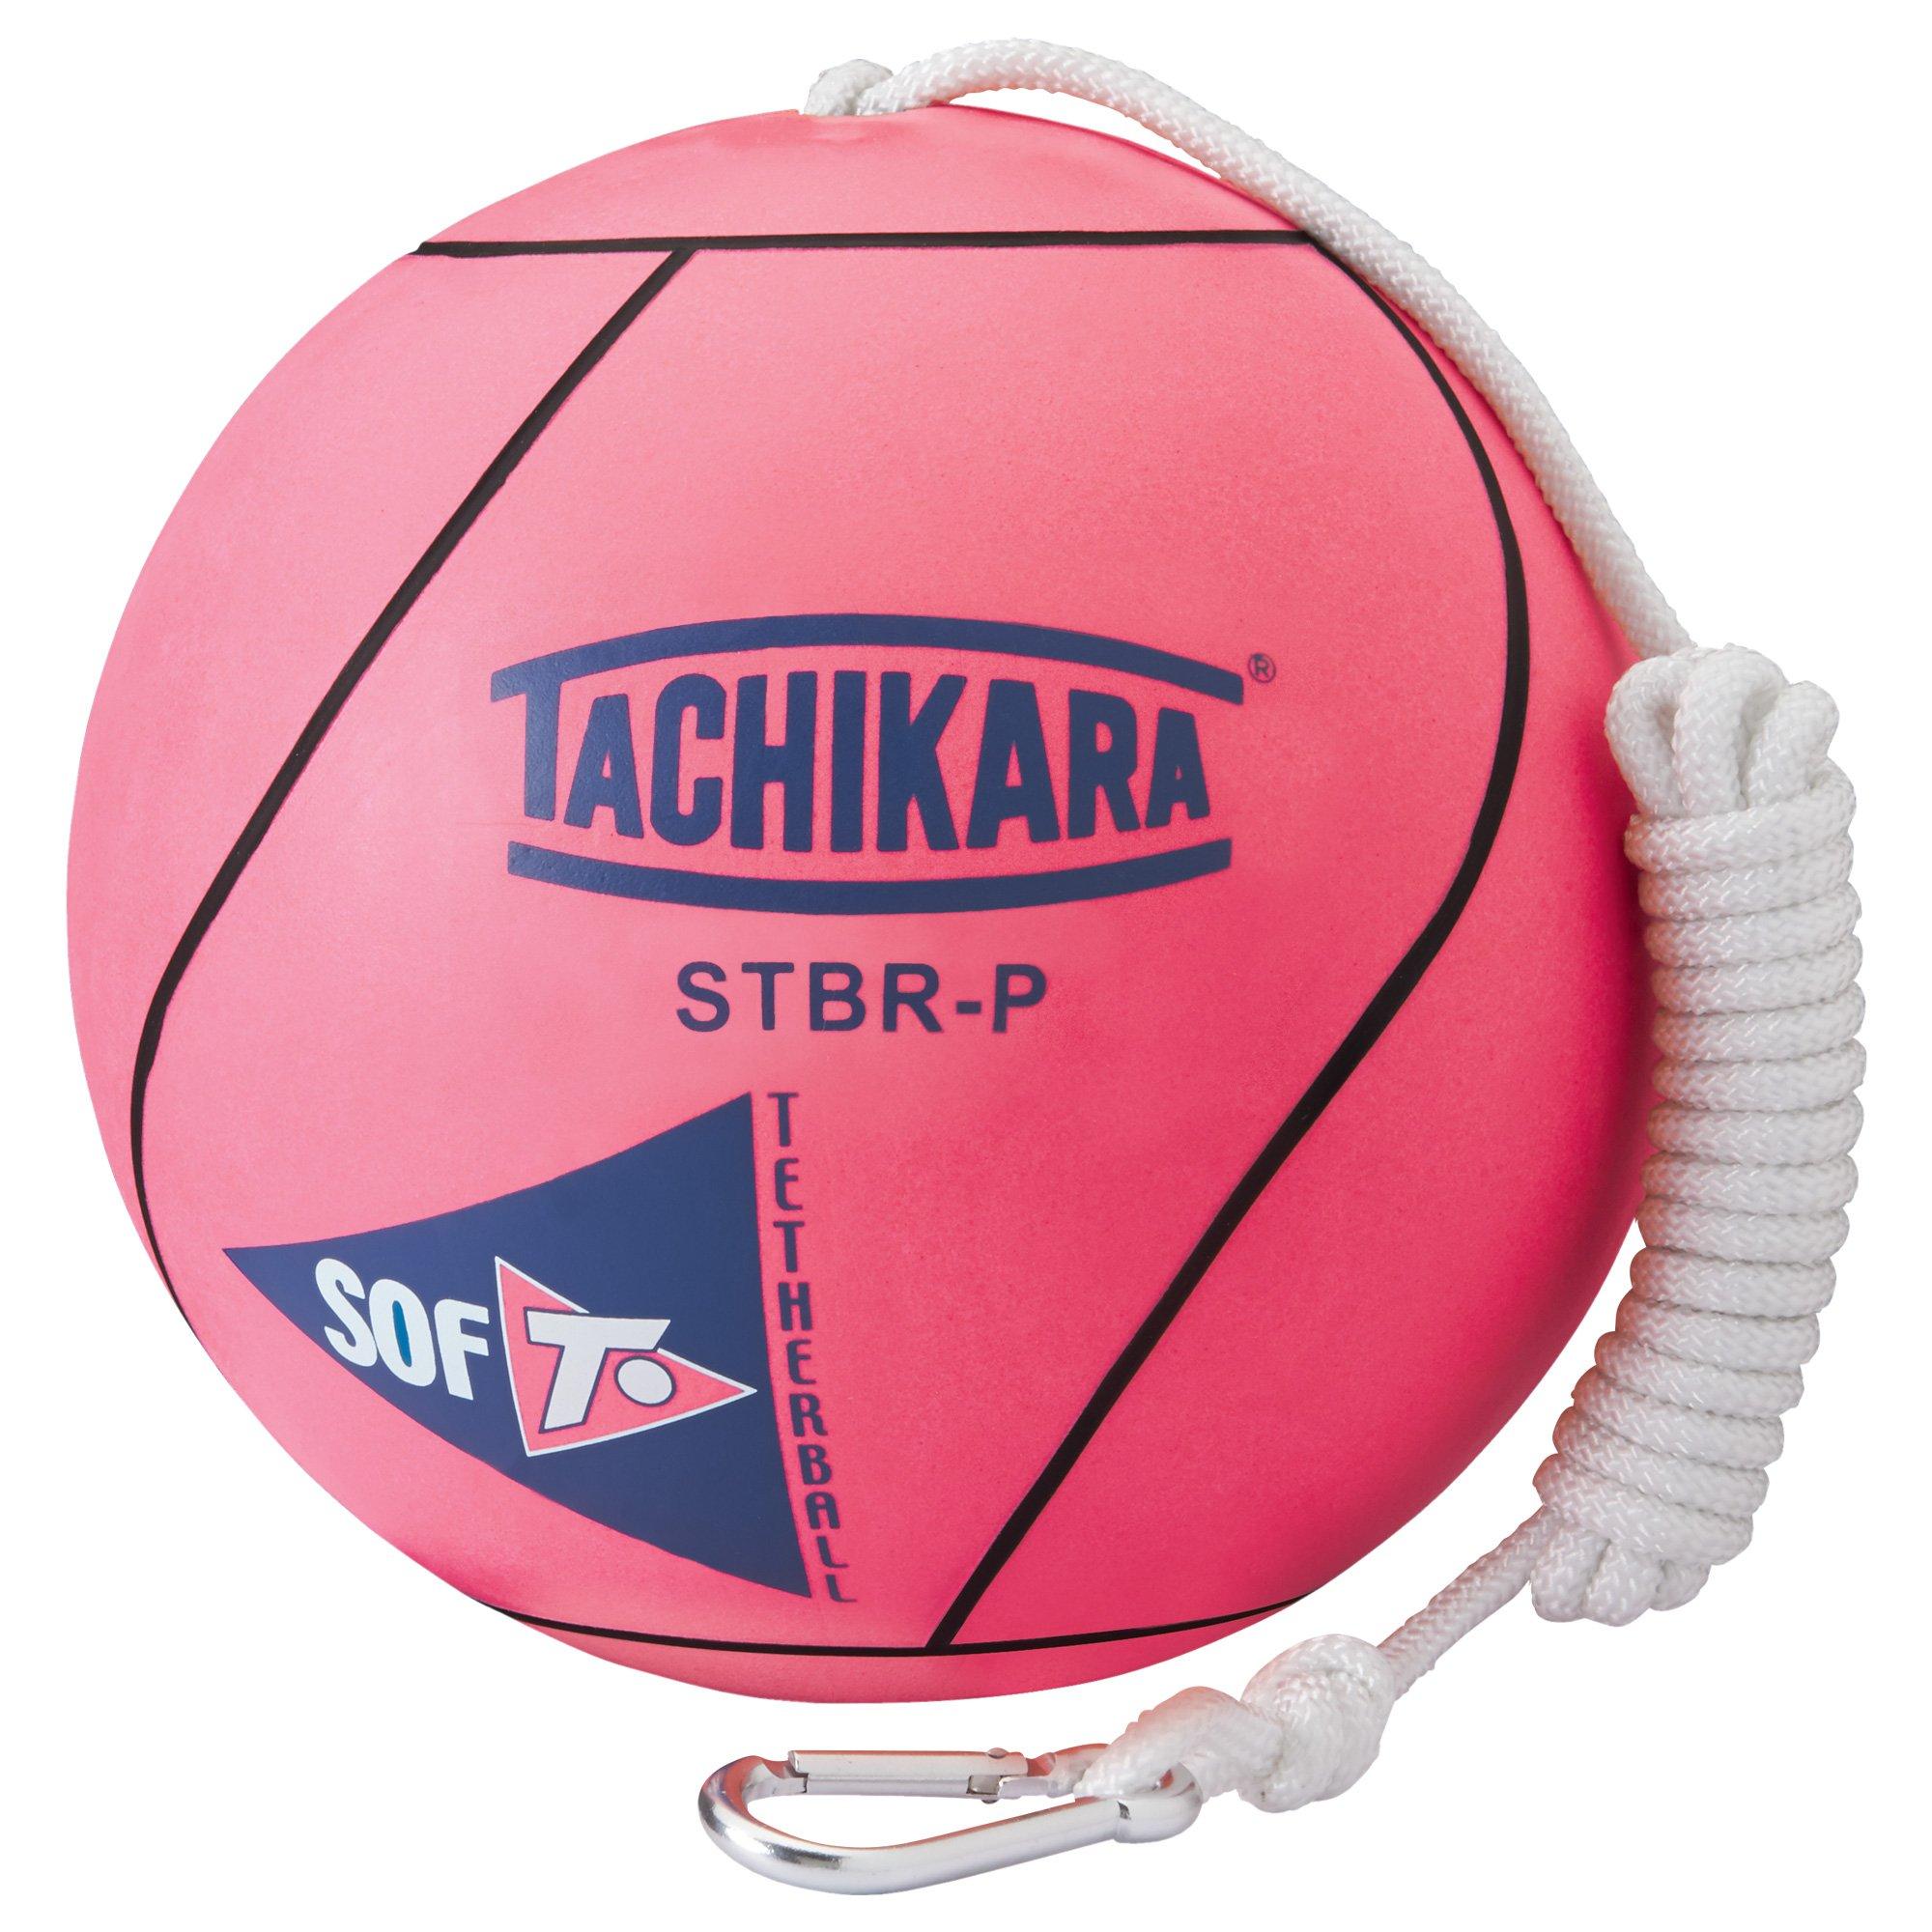 Tachikara STBR-P extra soft tetherball (pink).